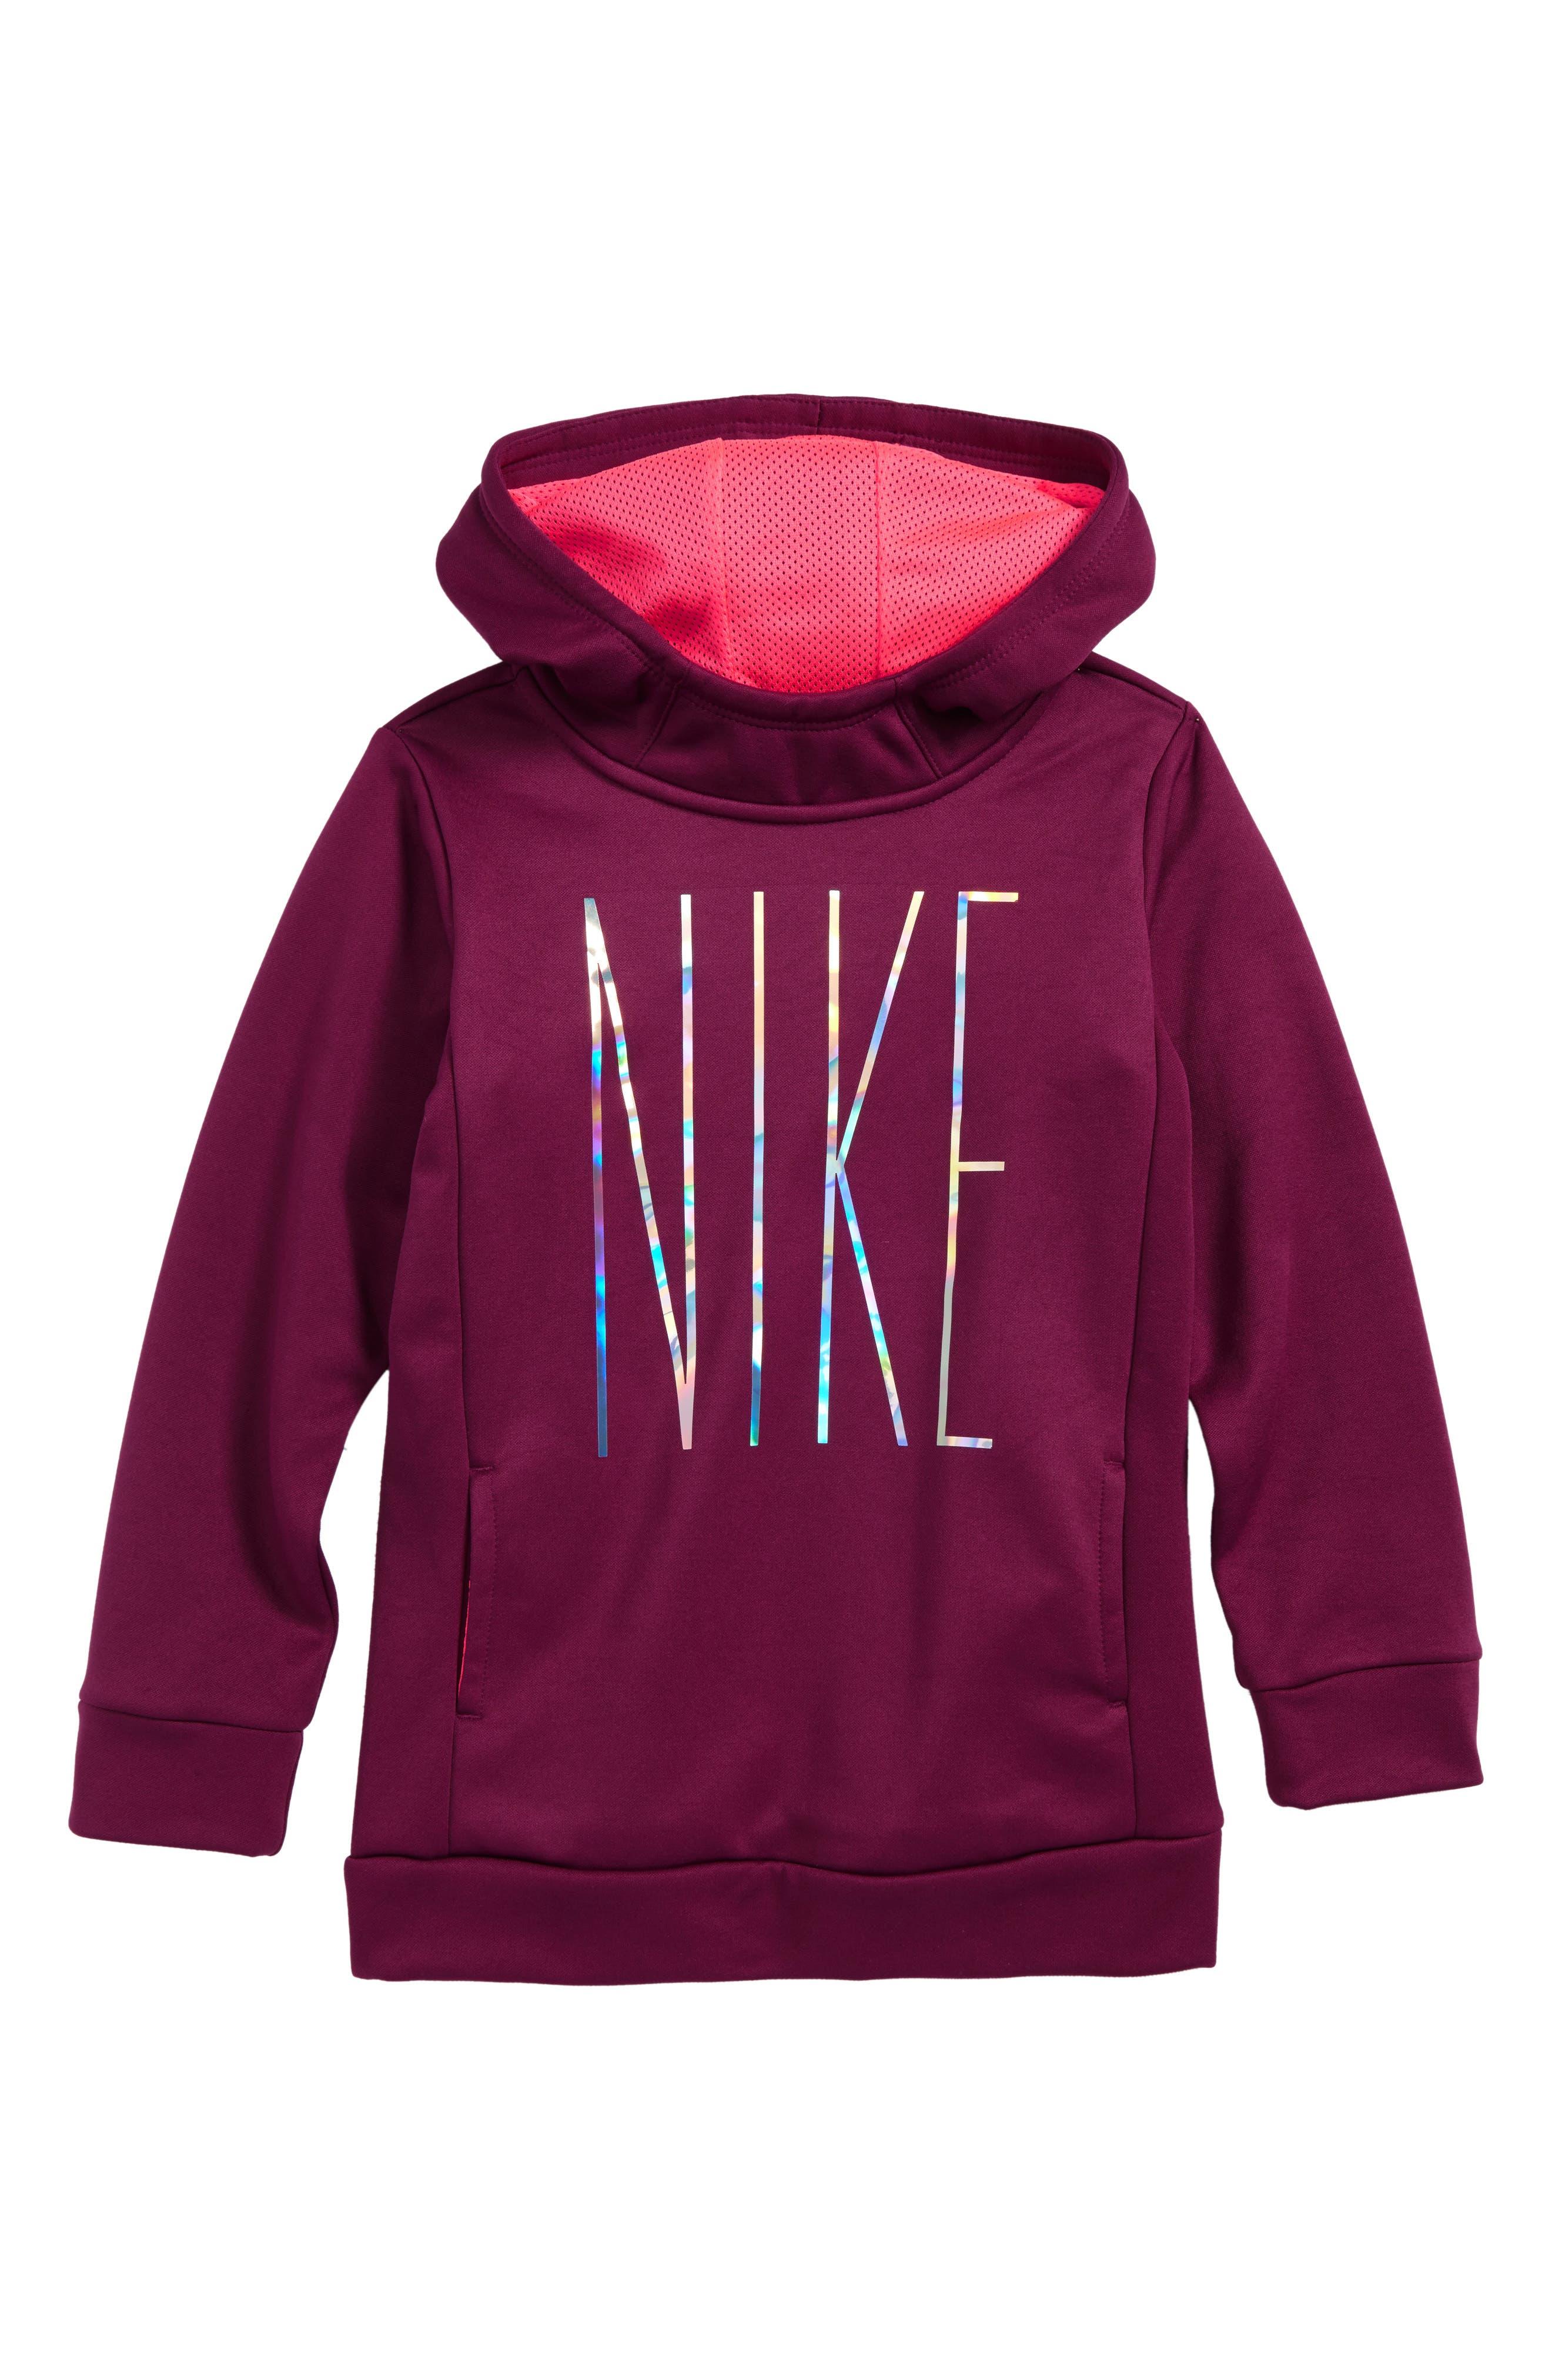 Alternate Image 1 Selected - Nike Therma-FIT Hoodie (Toddler Girls & Little Girls)